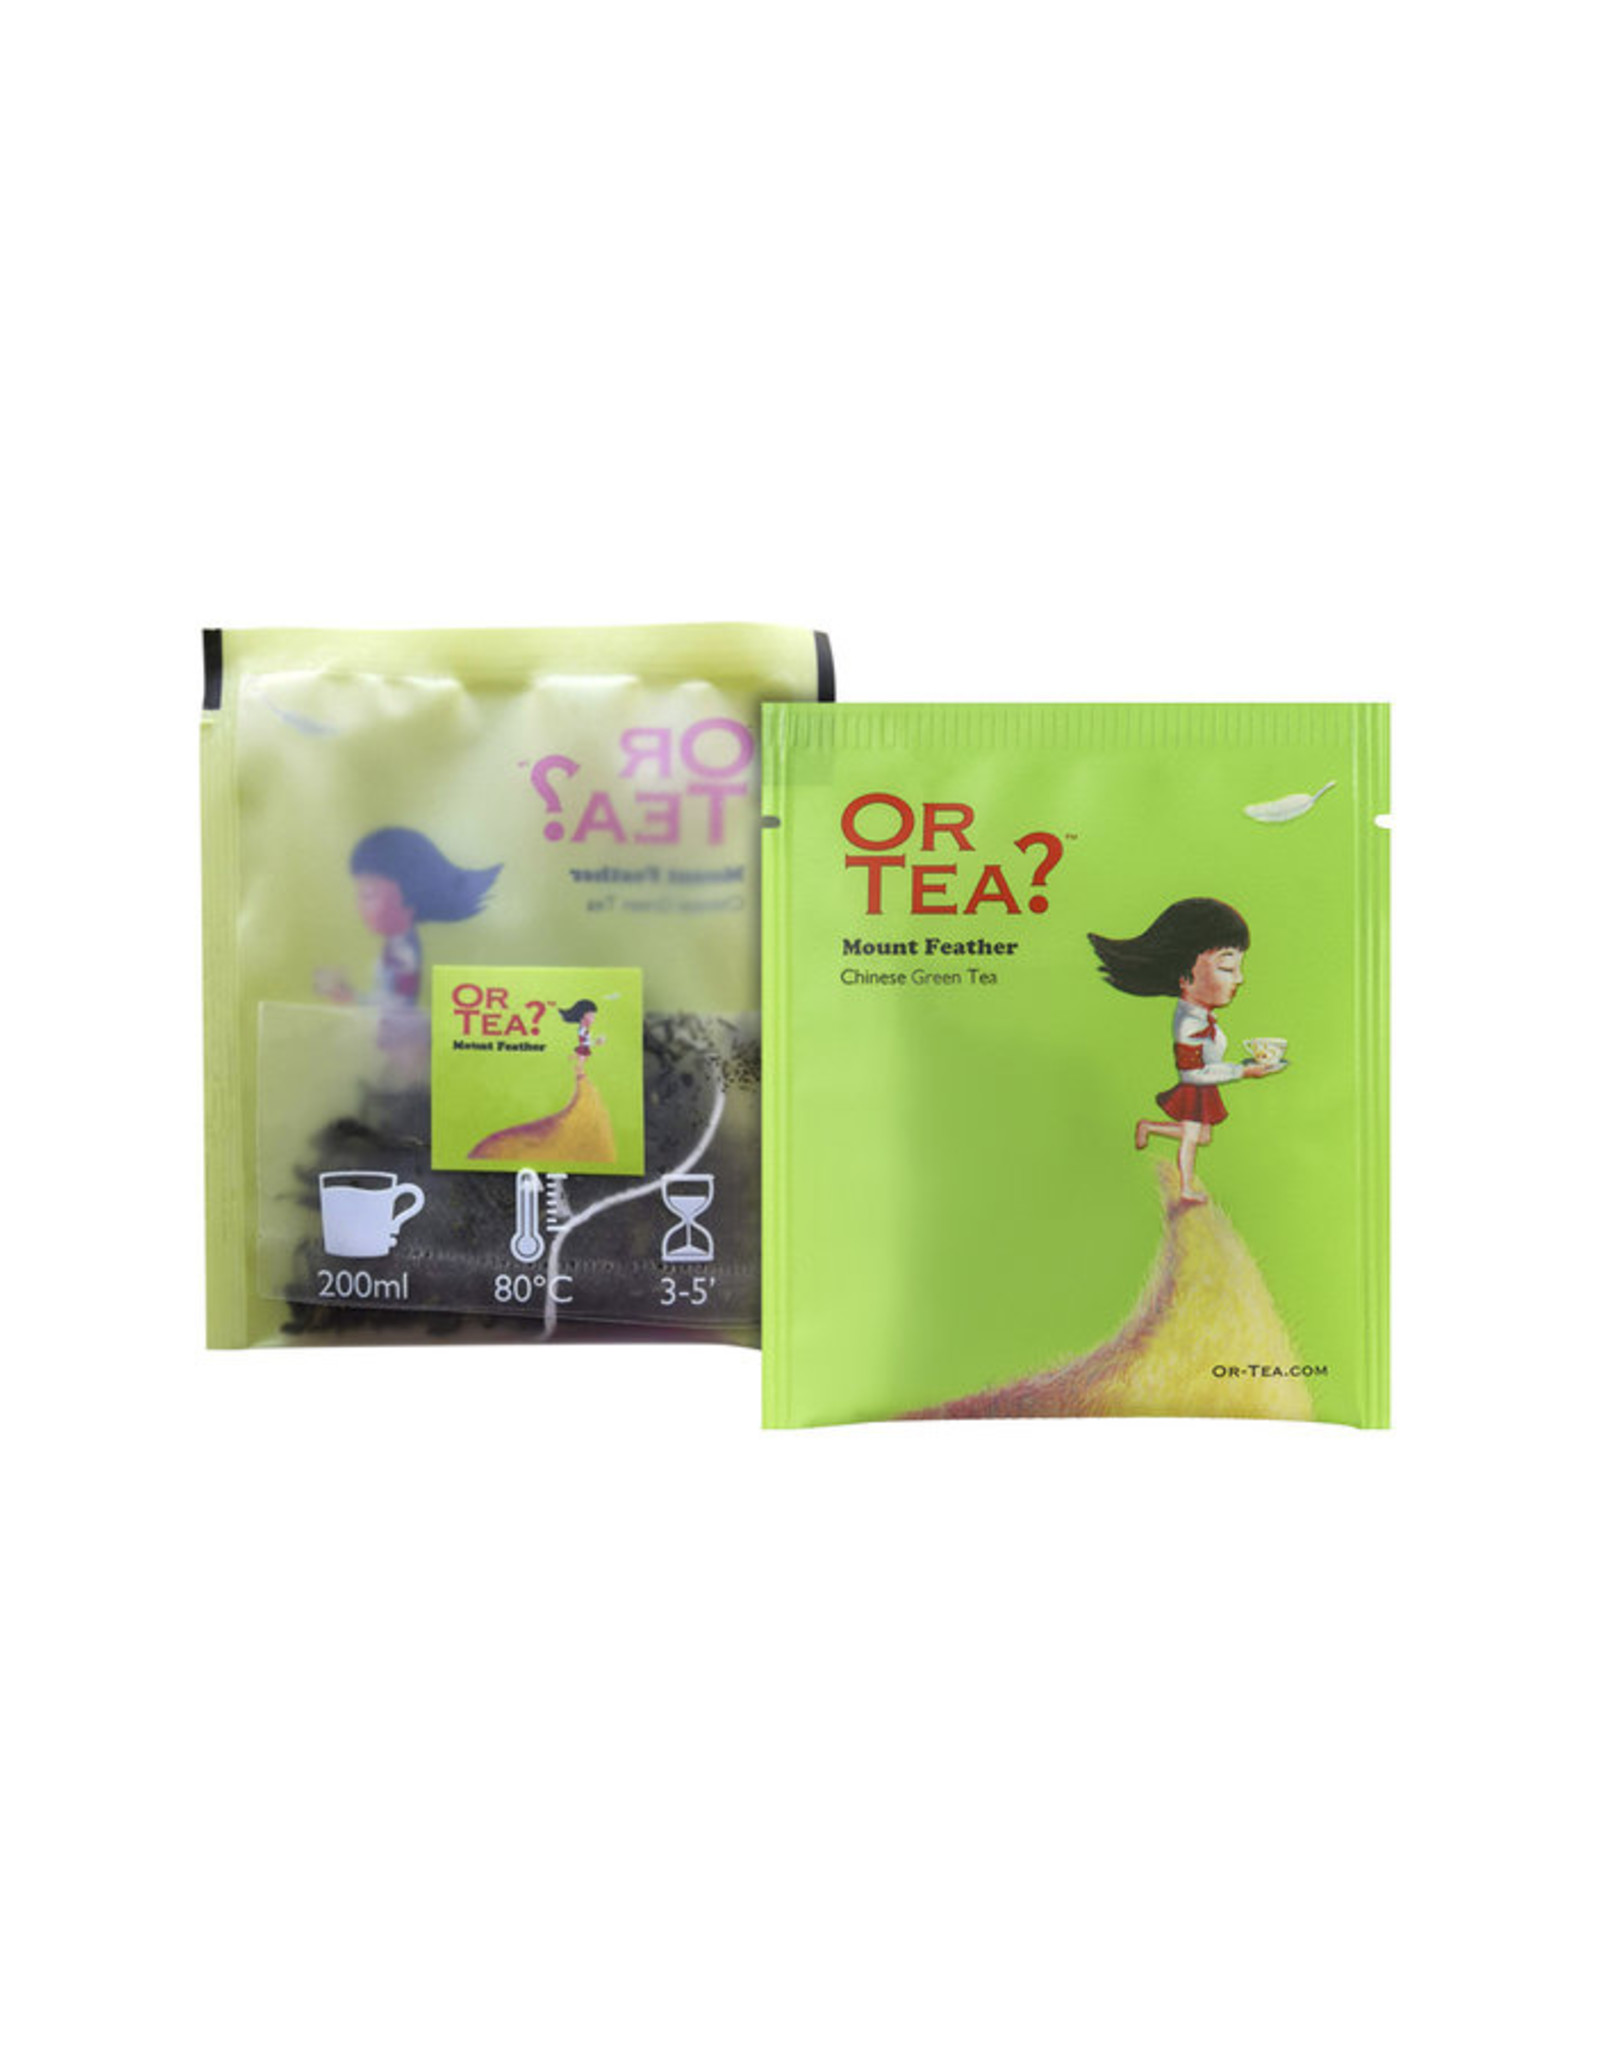 Or Tea? Organic Mount Feather - 10-Sachet Box (Pillow)